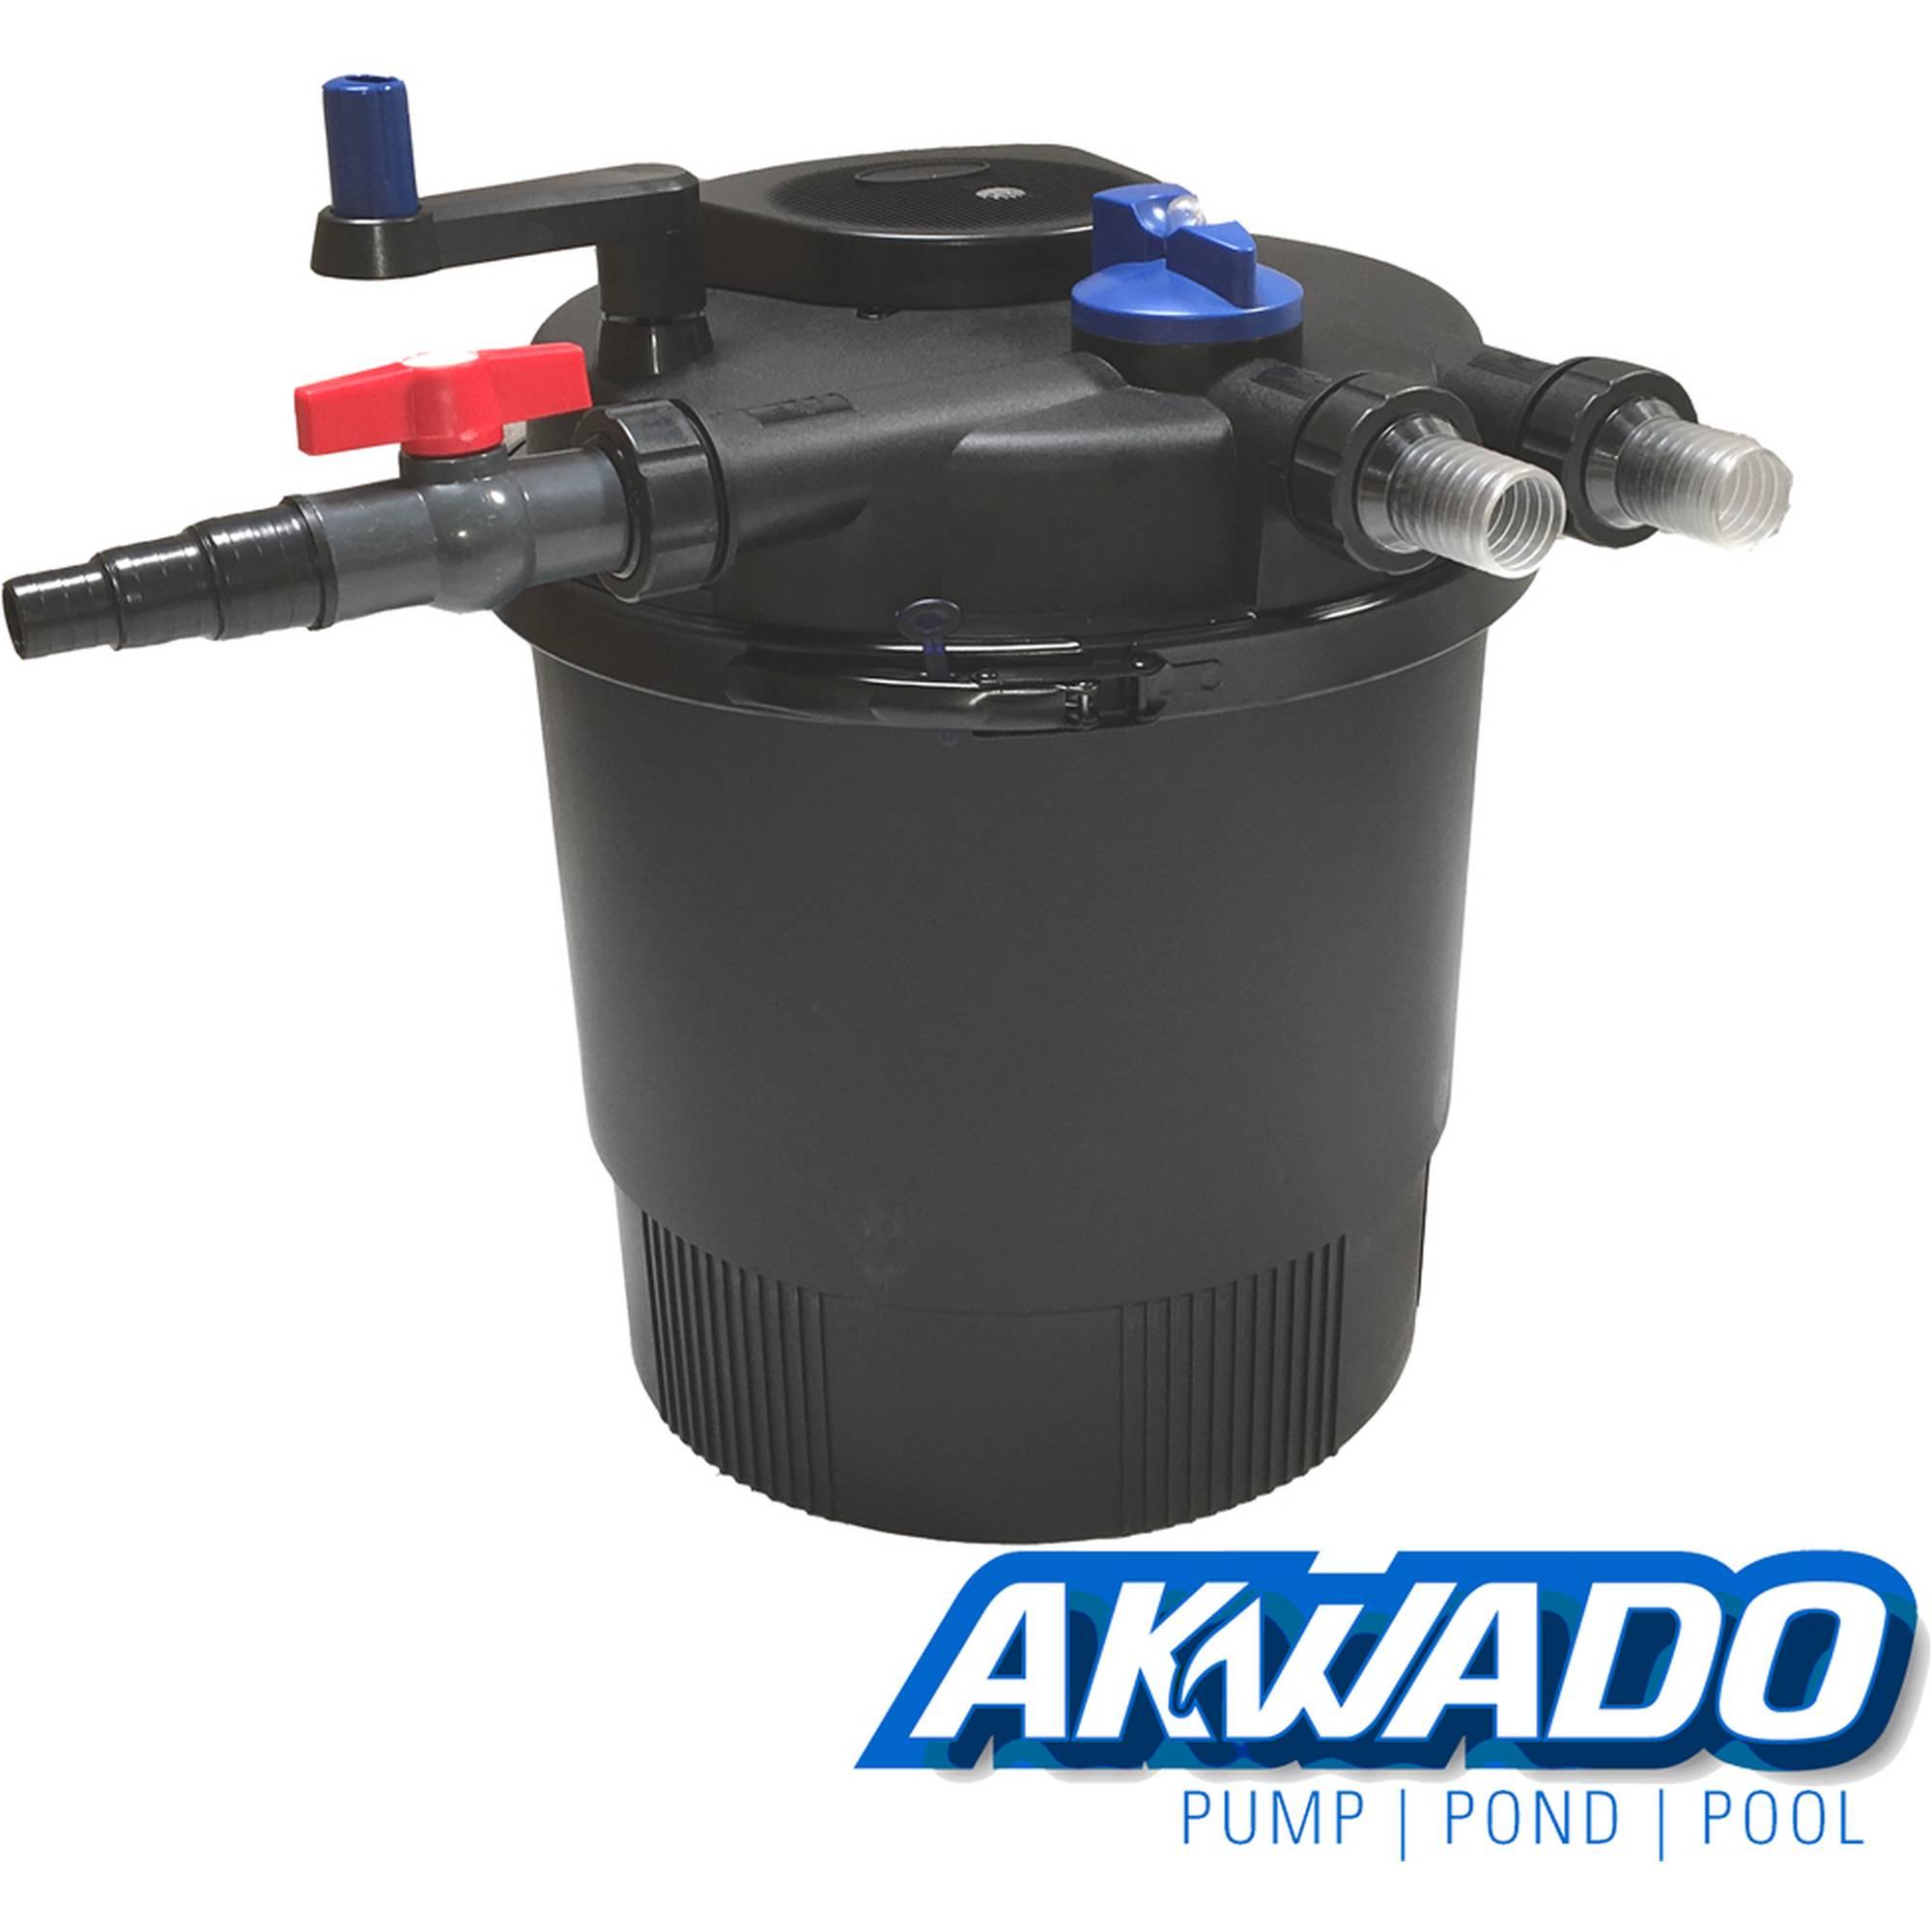 AKWADO Teichdruckfilter